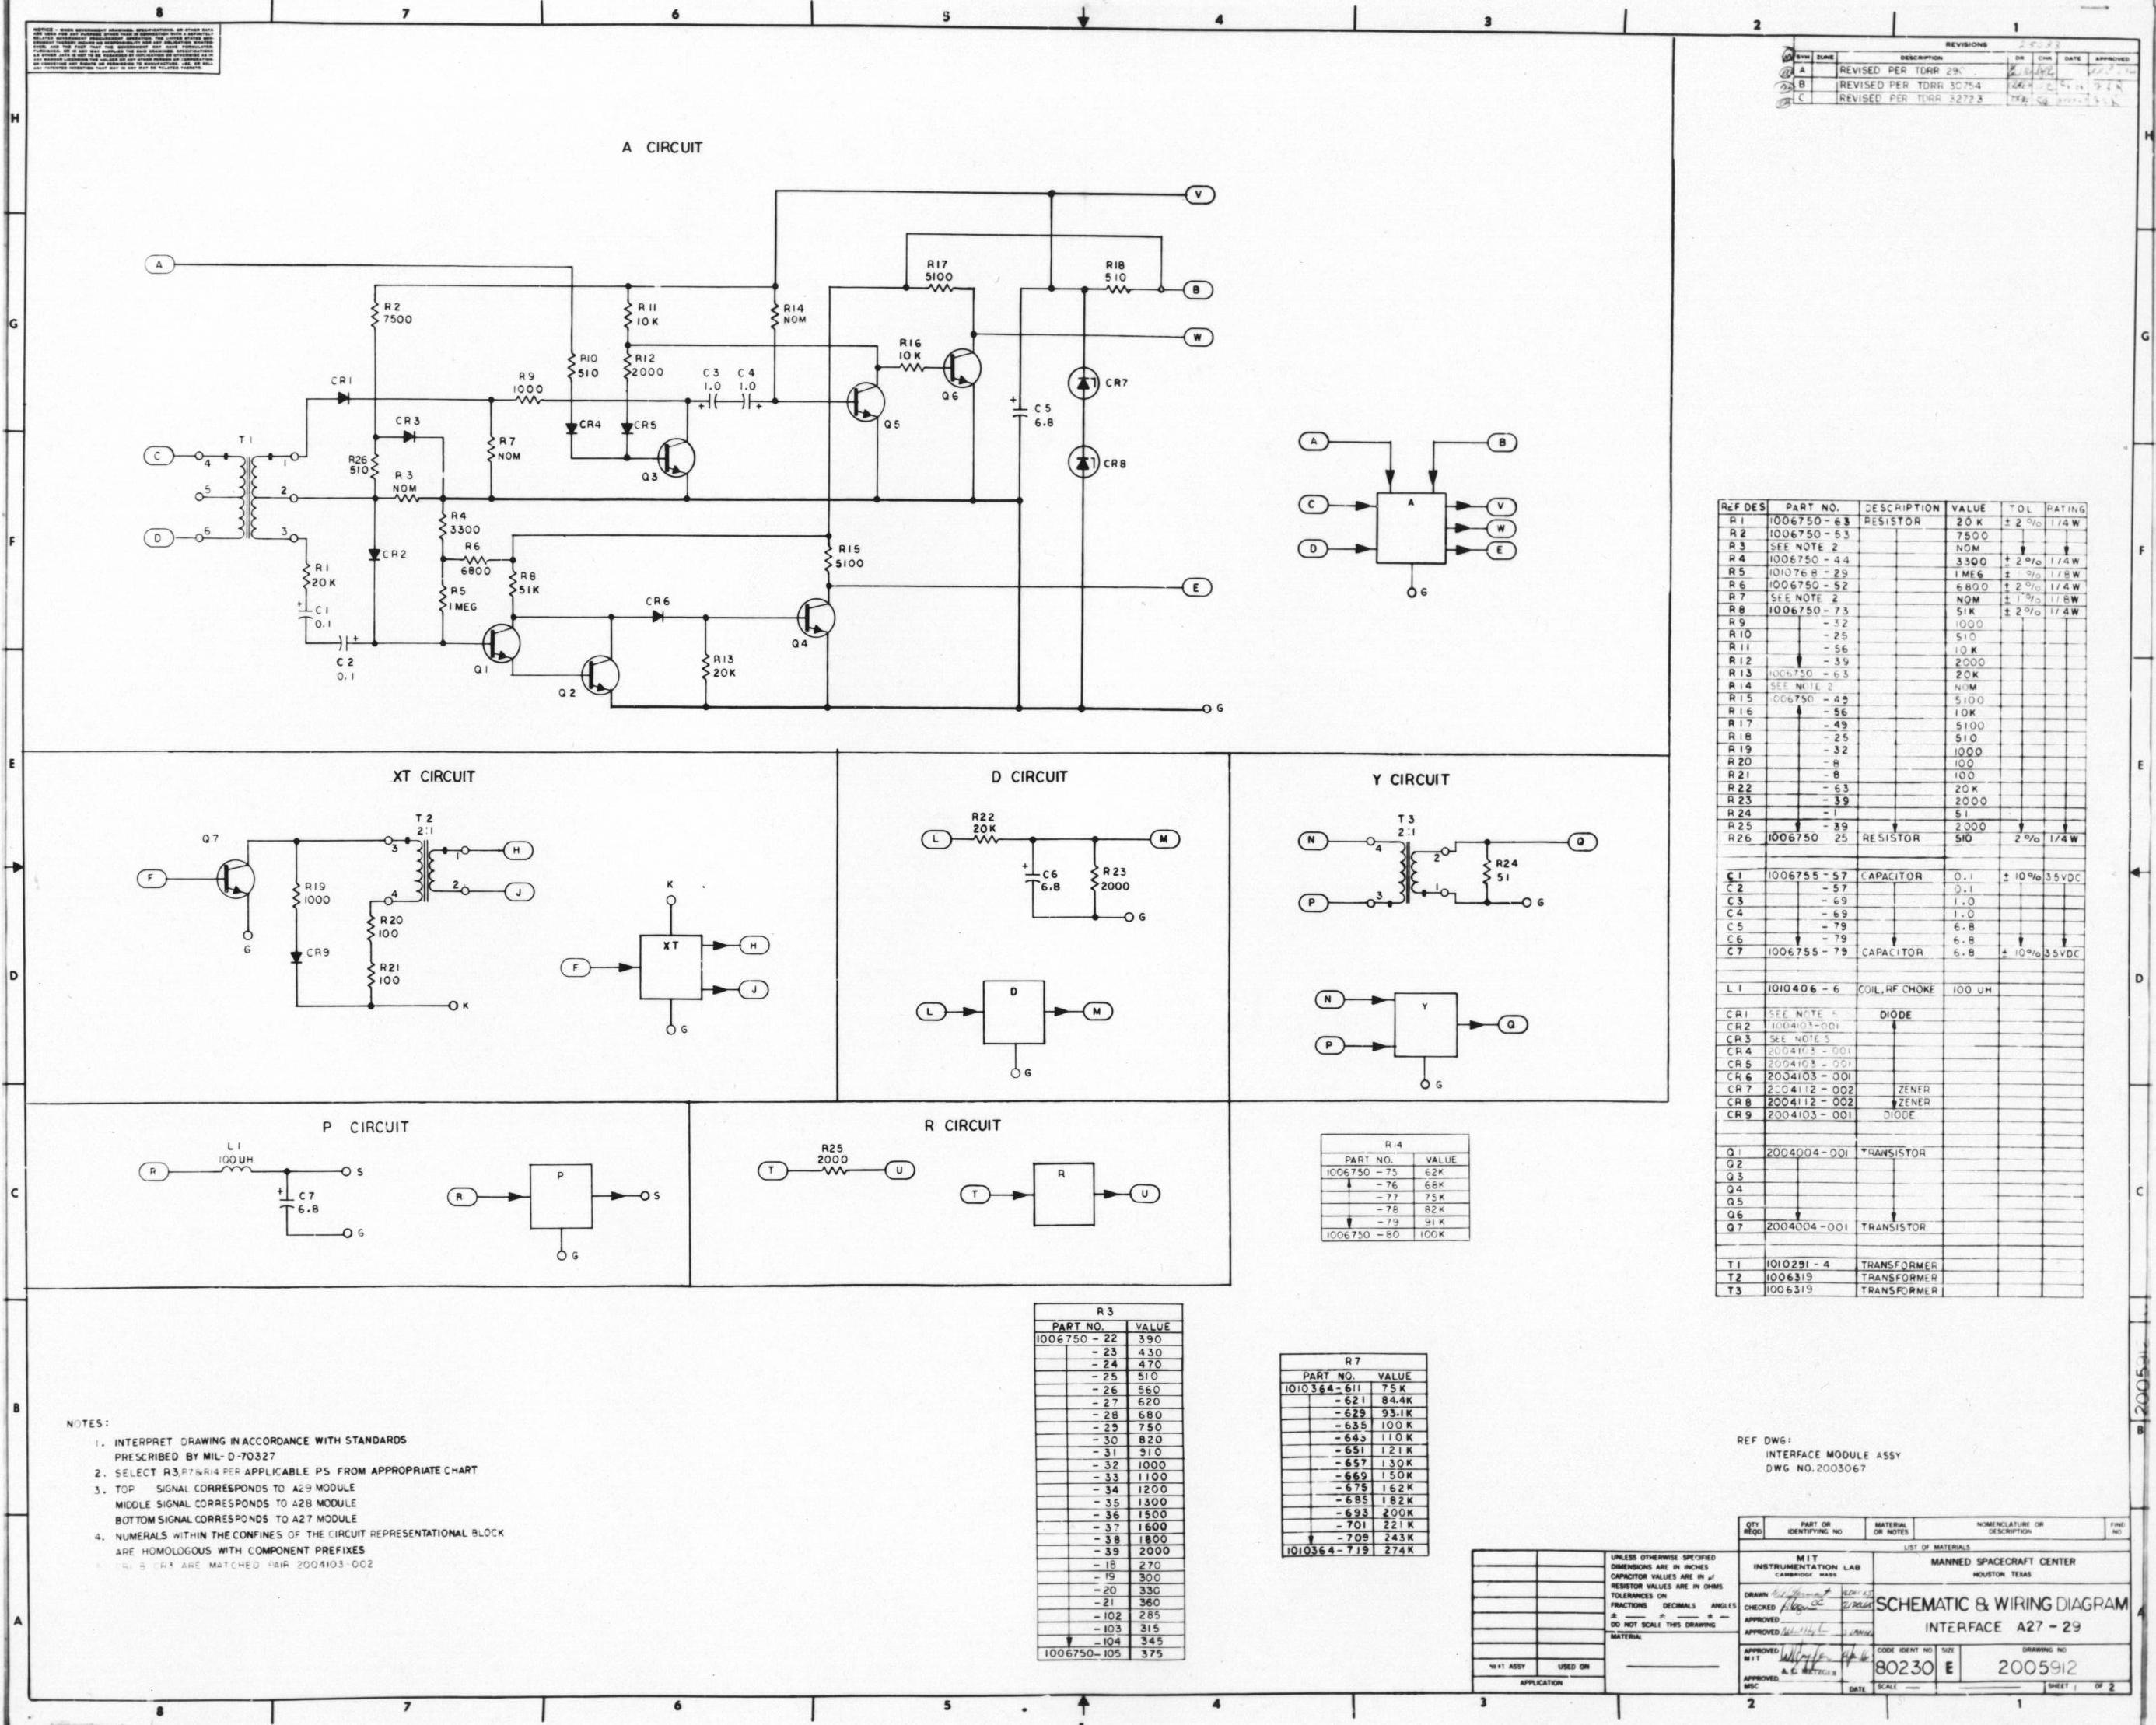 daewoo lanos wiring diagram electrical two way switch 2000 stereo scion xa